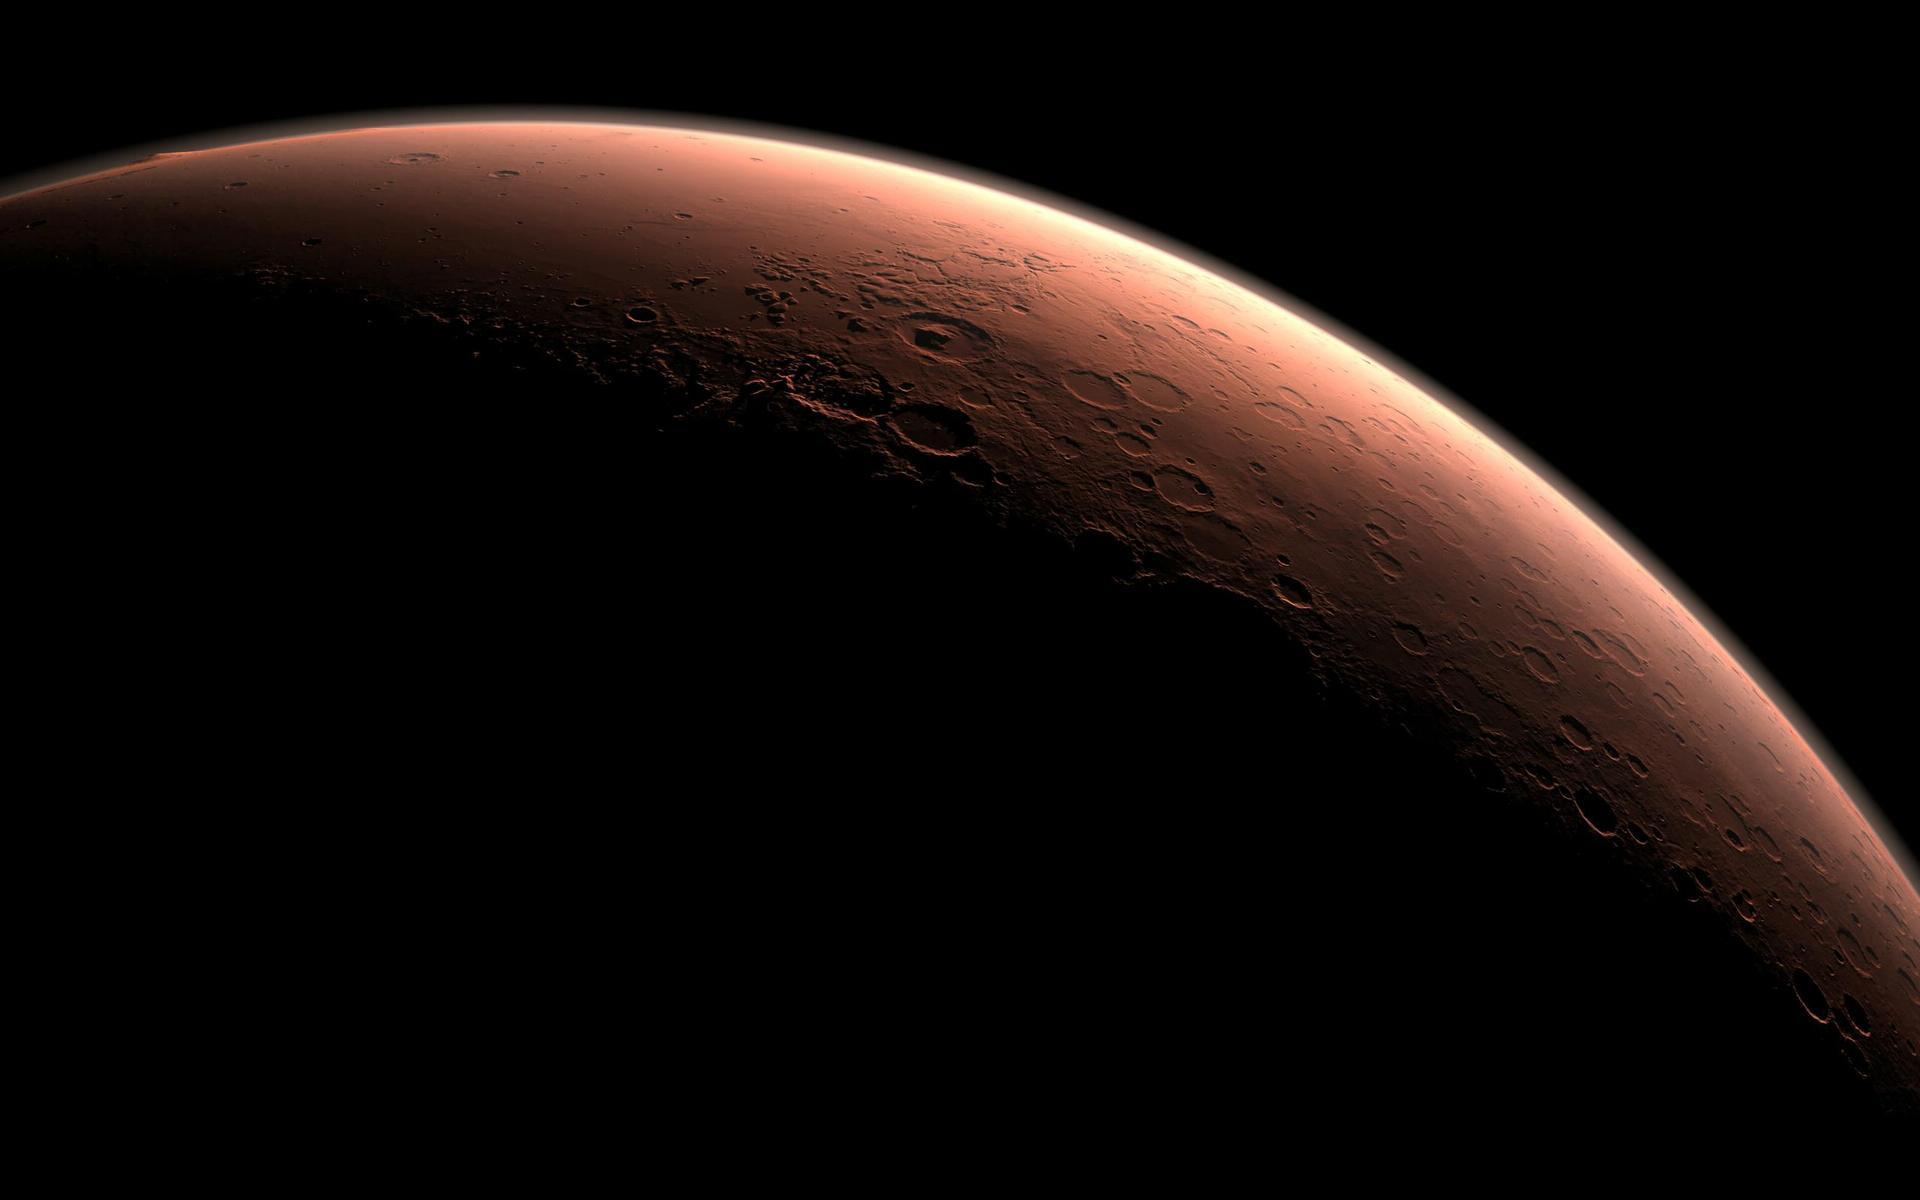 Mars Planet Wallpaper 48837 1920x1200 px ~ HDWallSource com